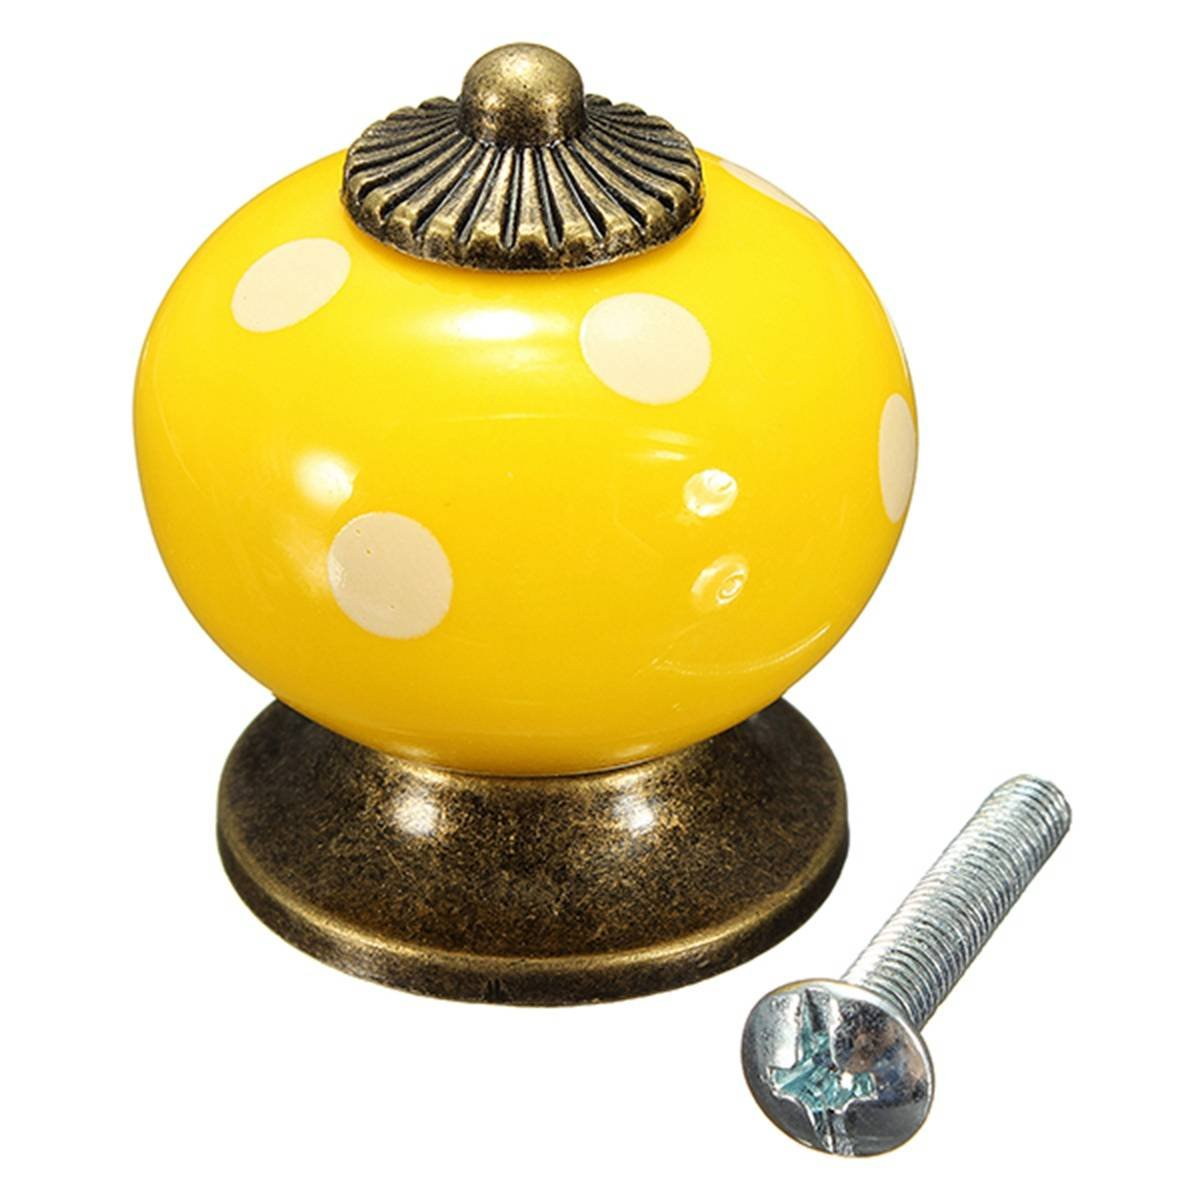 WSFS Hot Sale 10pcs Retro Polka Dot Ceramic Door Knob Cabinet Cupboard Drawer Locker Handles Yellow<br><br>Aliexpress